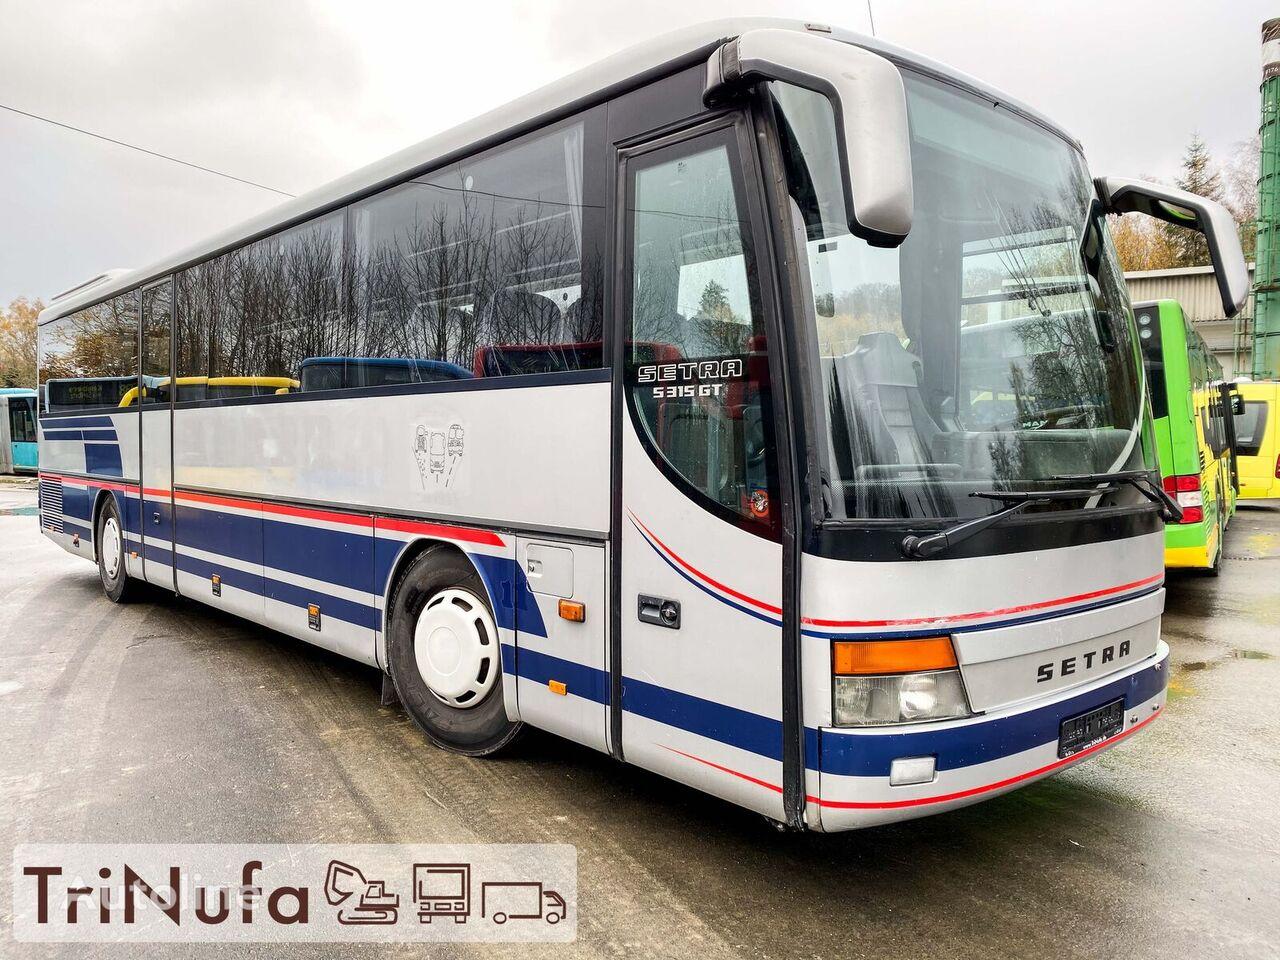 SETRA S 315 GT - UL | Klimaanlage | ATG | Retarder | interurban bus